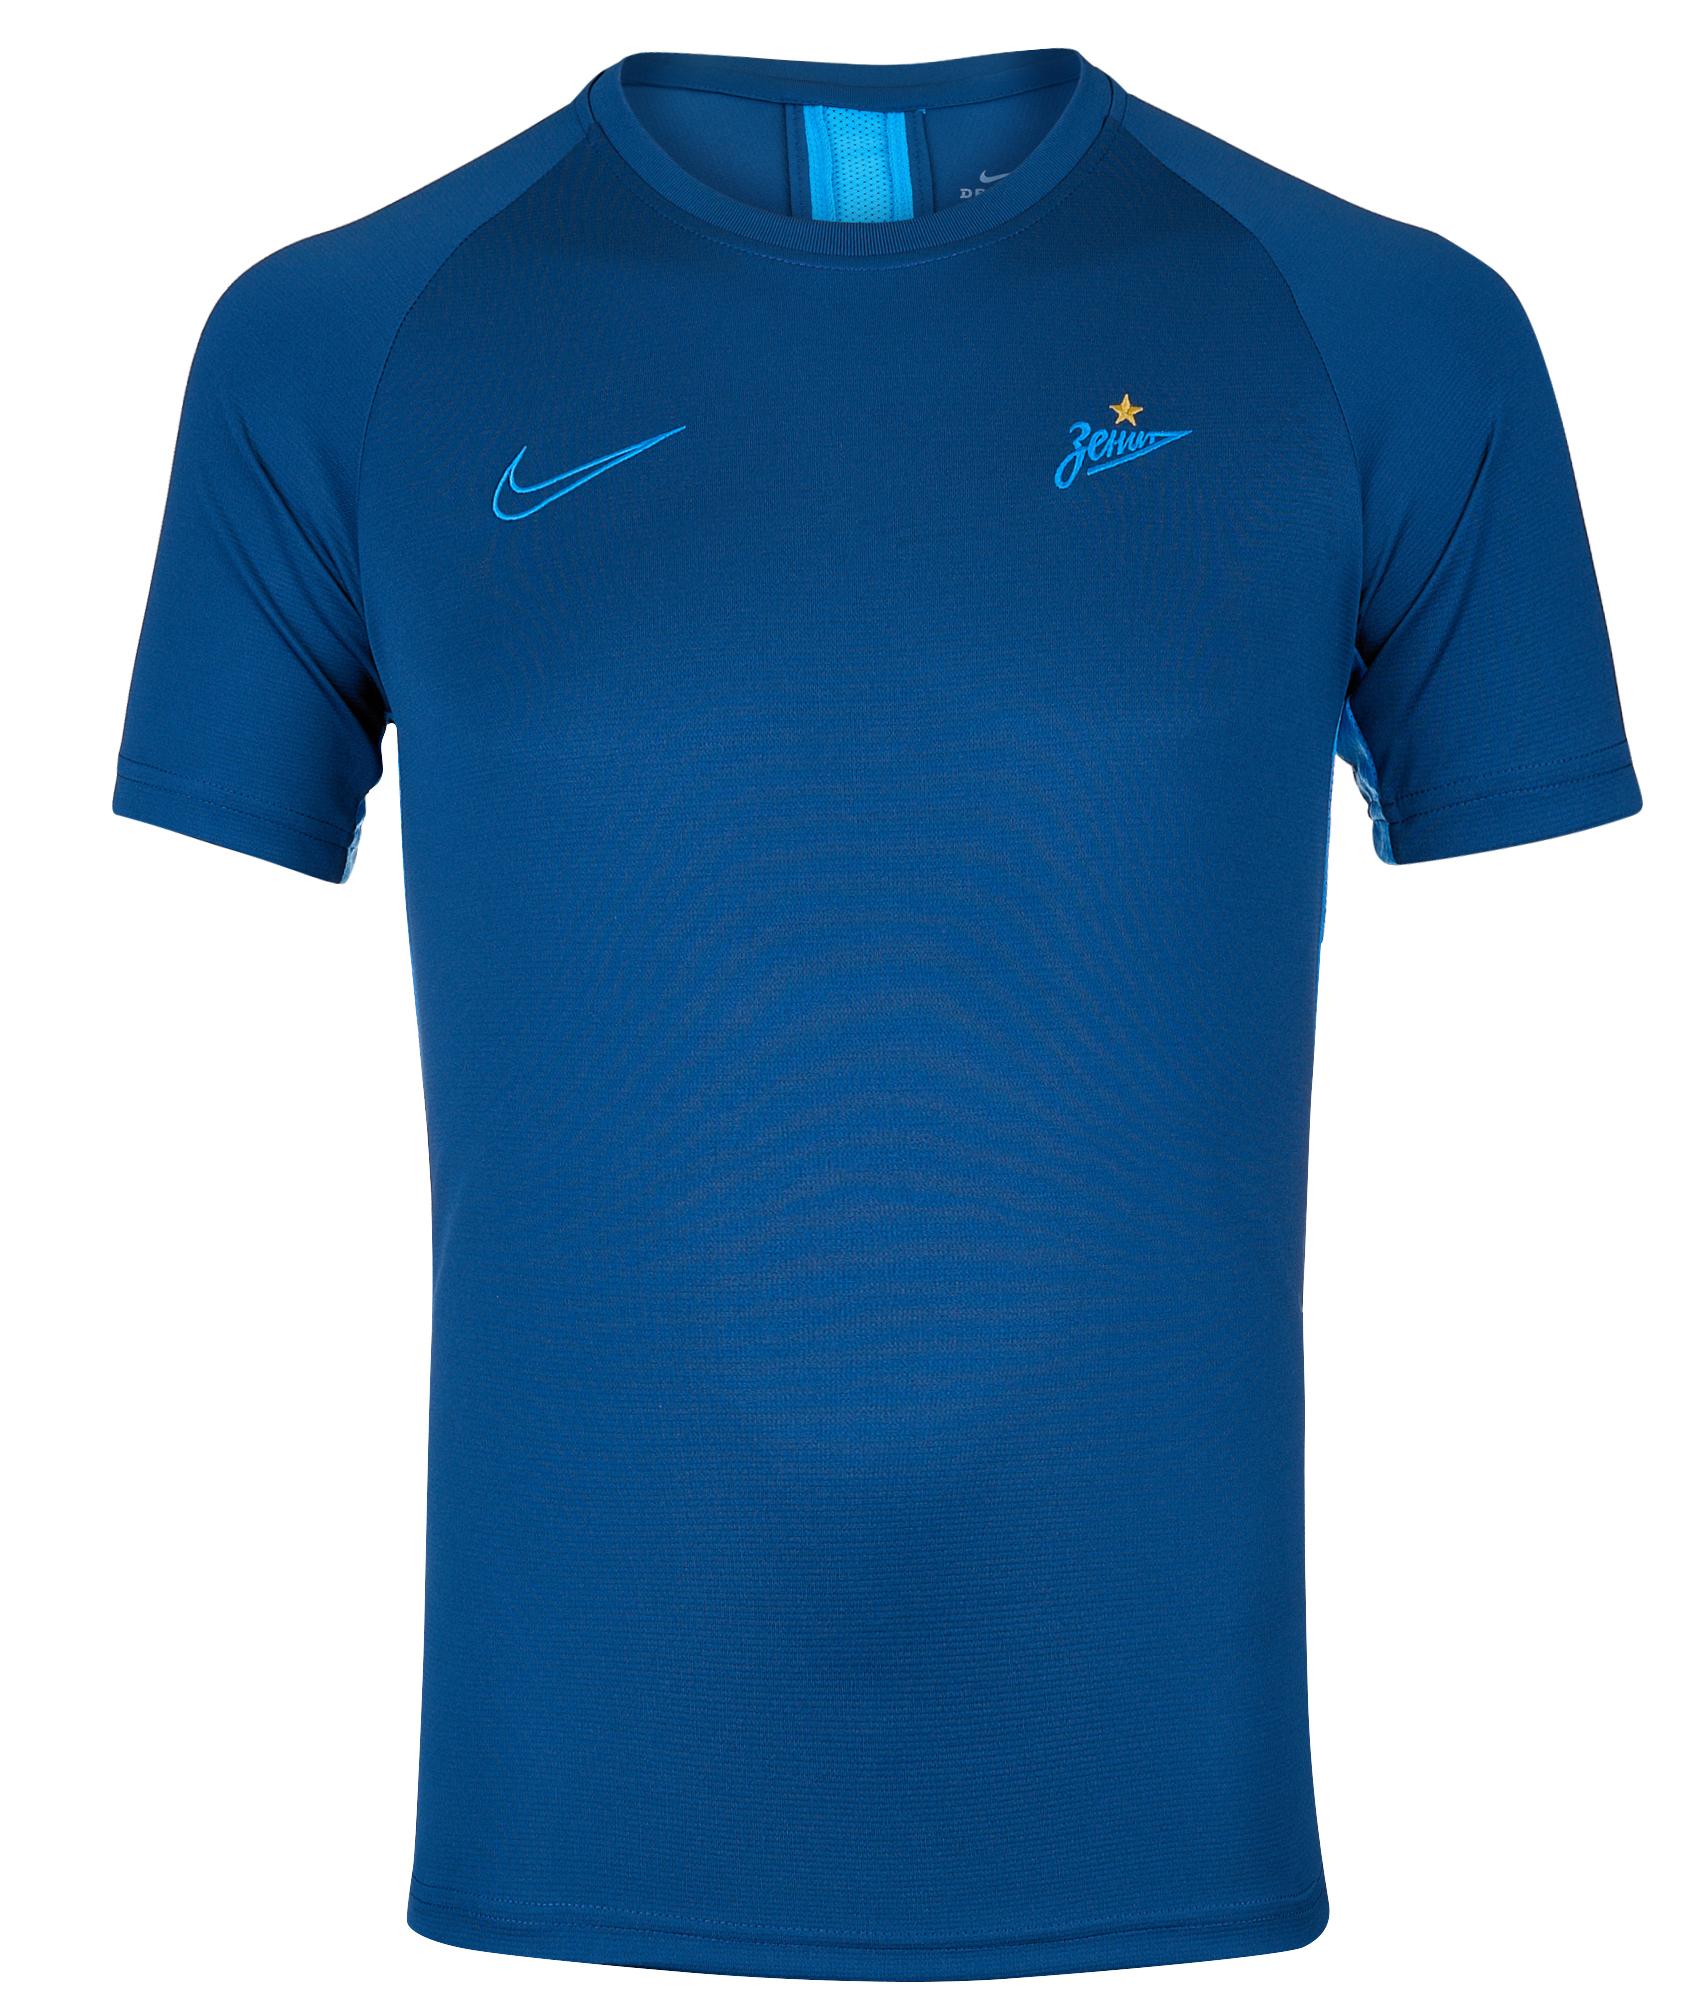 цена на Футболка тренировочная подростковая Nike Nike Цвет-Синий